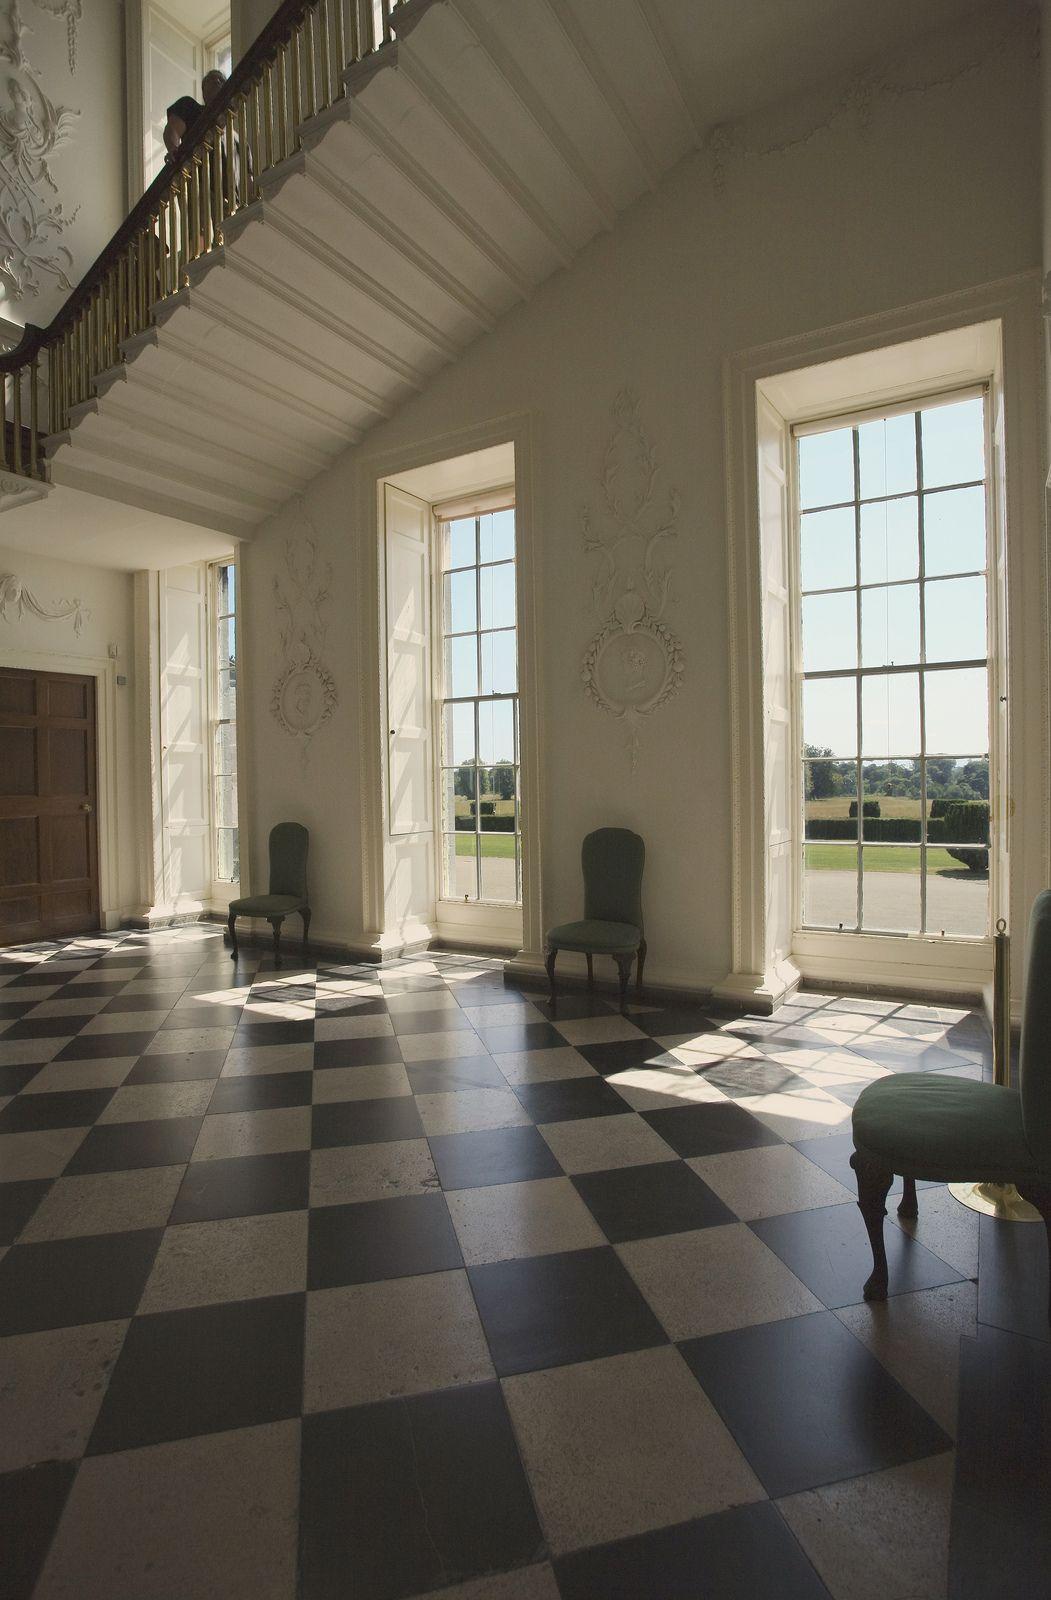 Hallway leading to the ladies rooms - Room